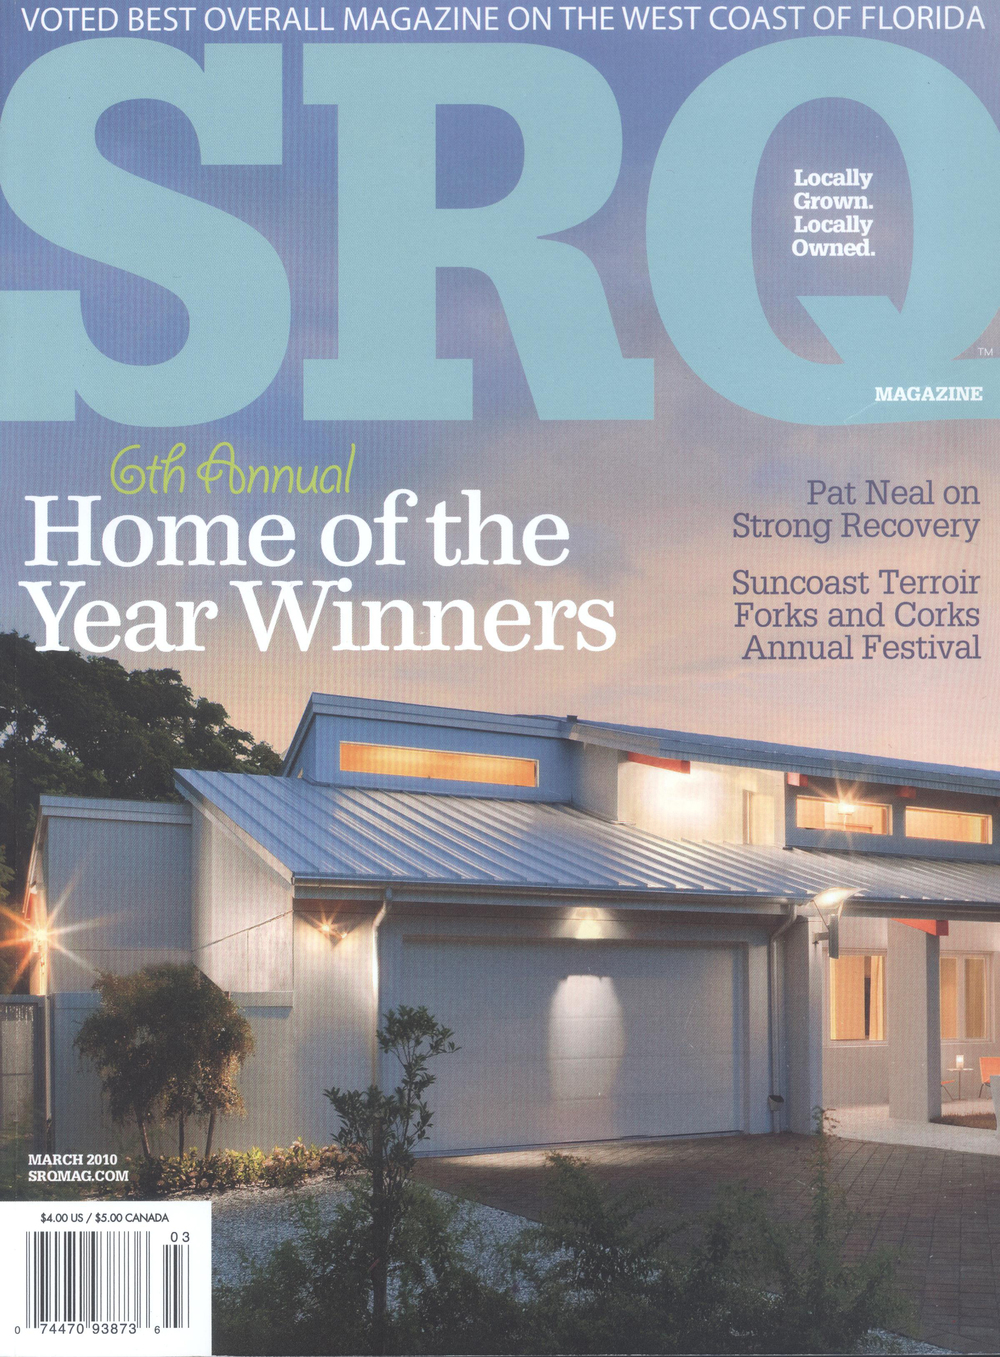 2010_SRQ_March Cover.jpg